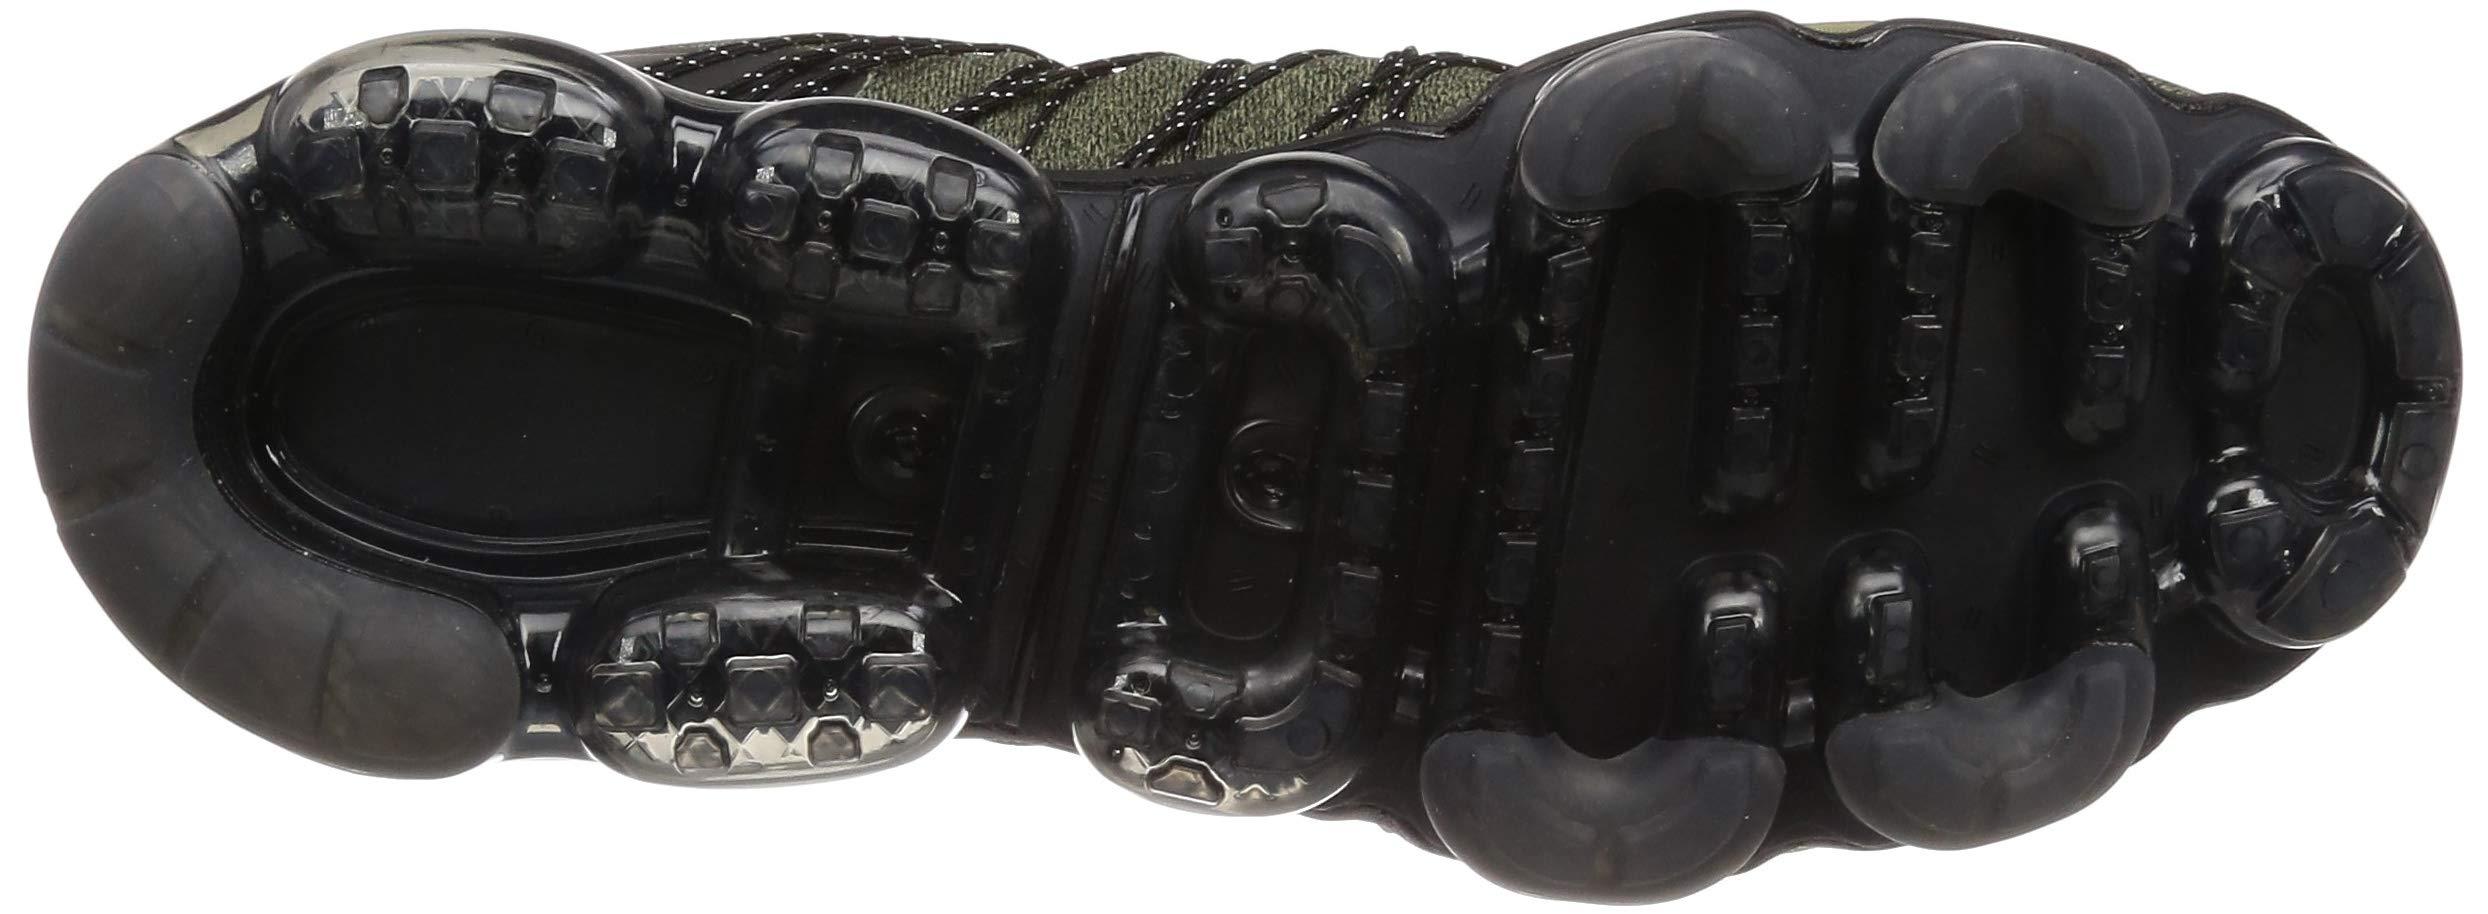 71UwKAIbklL - Nike Men's Air Vapormax Run Utility, Medium Olive/Reflect Silver